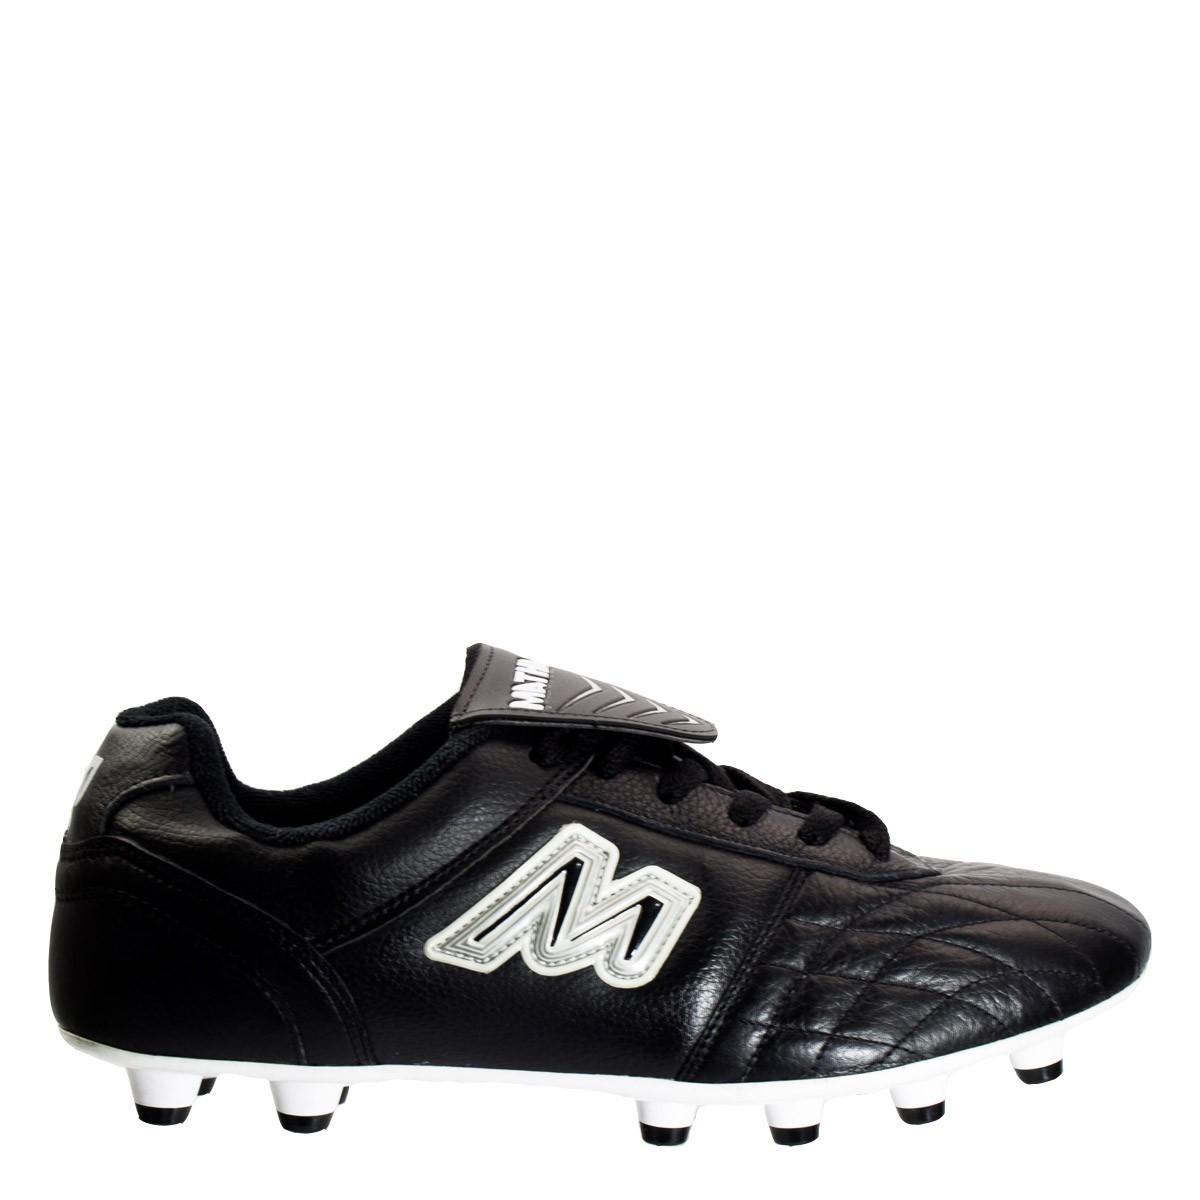 d9b72cd46b Bizz Store - Chuteira Masculina Futebol de Campo Mathaus Prisma